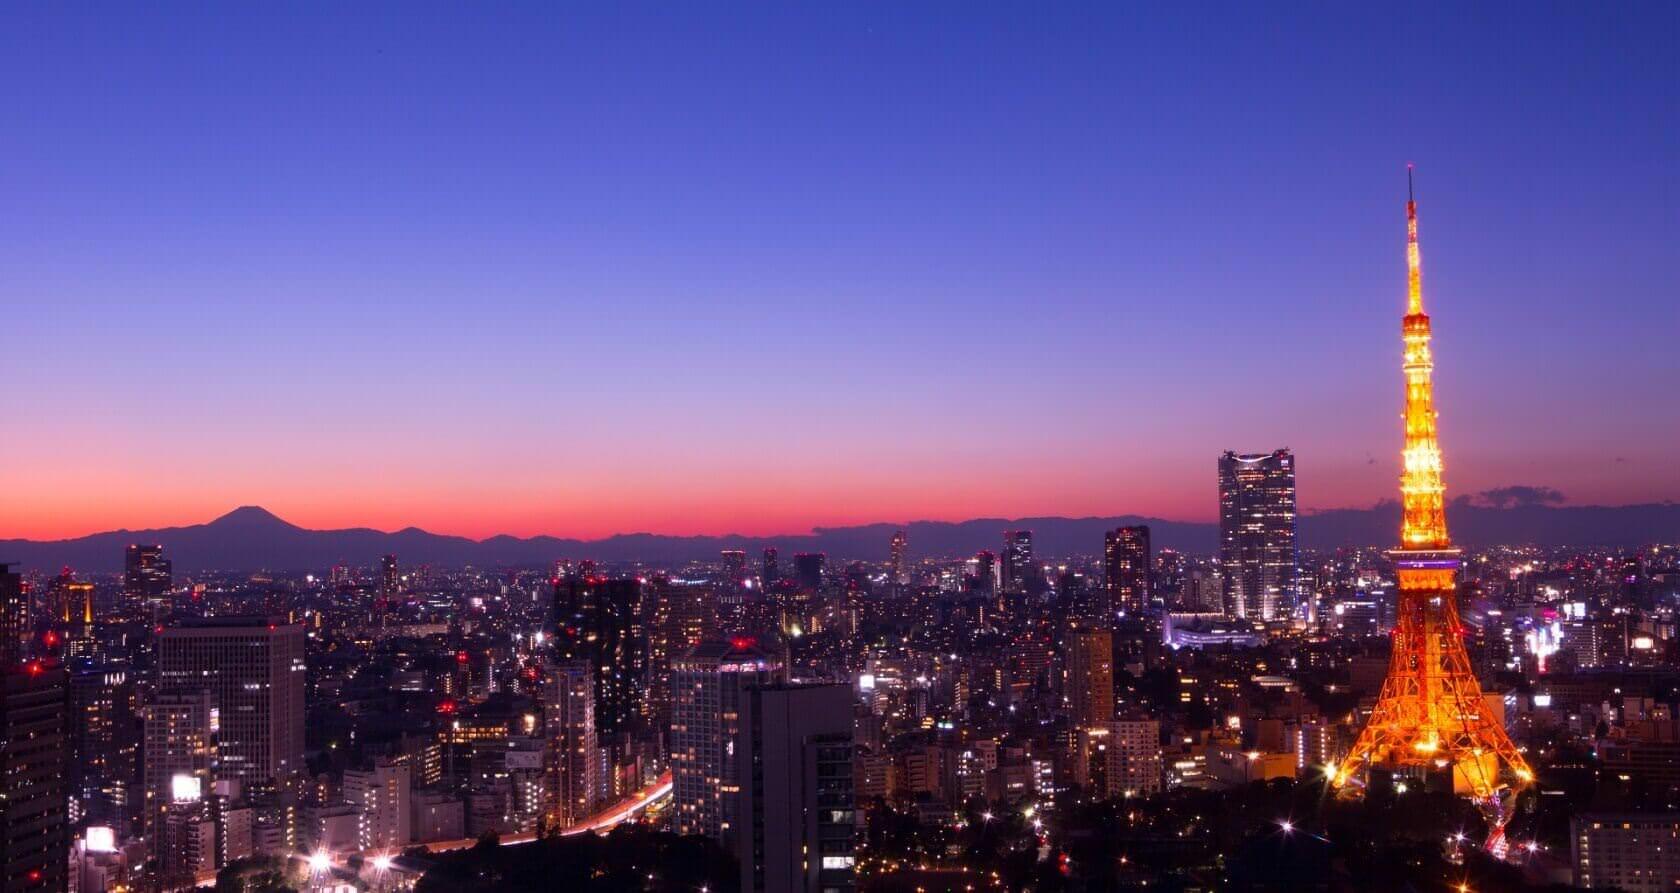 Tokyo TowerSkyline